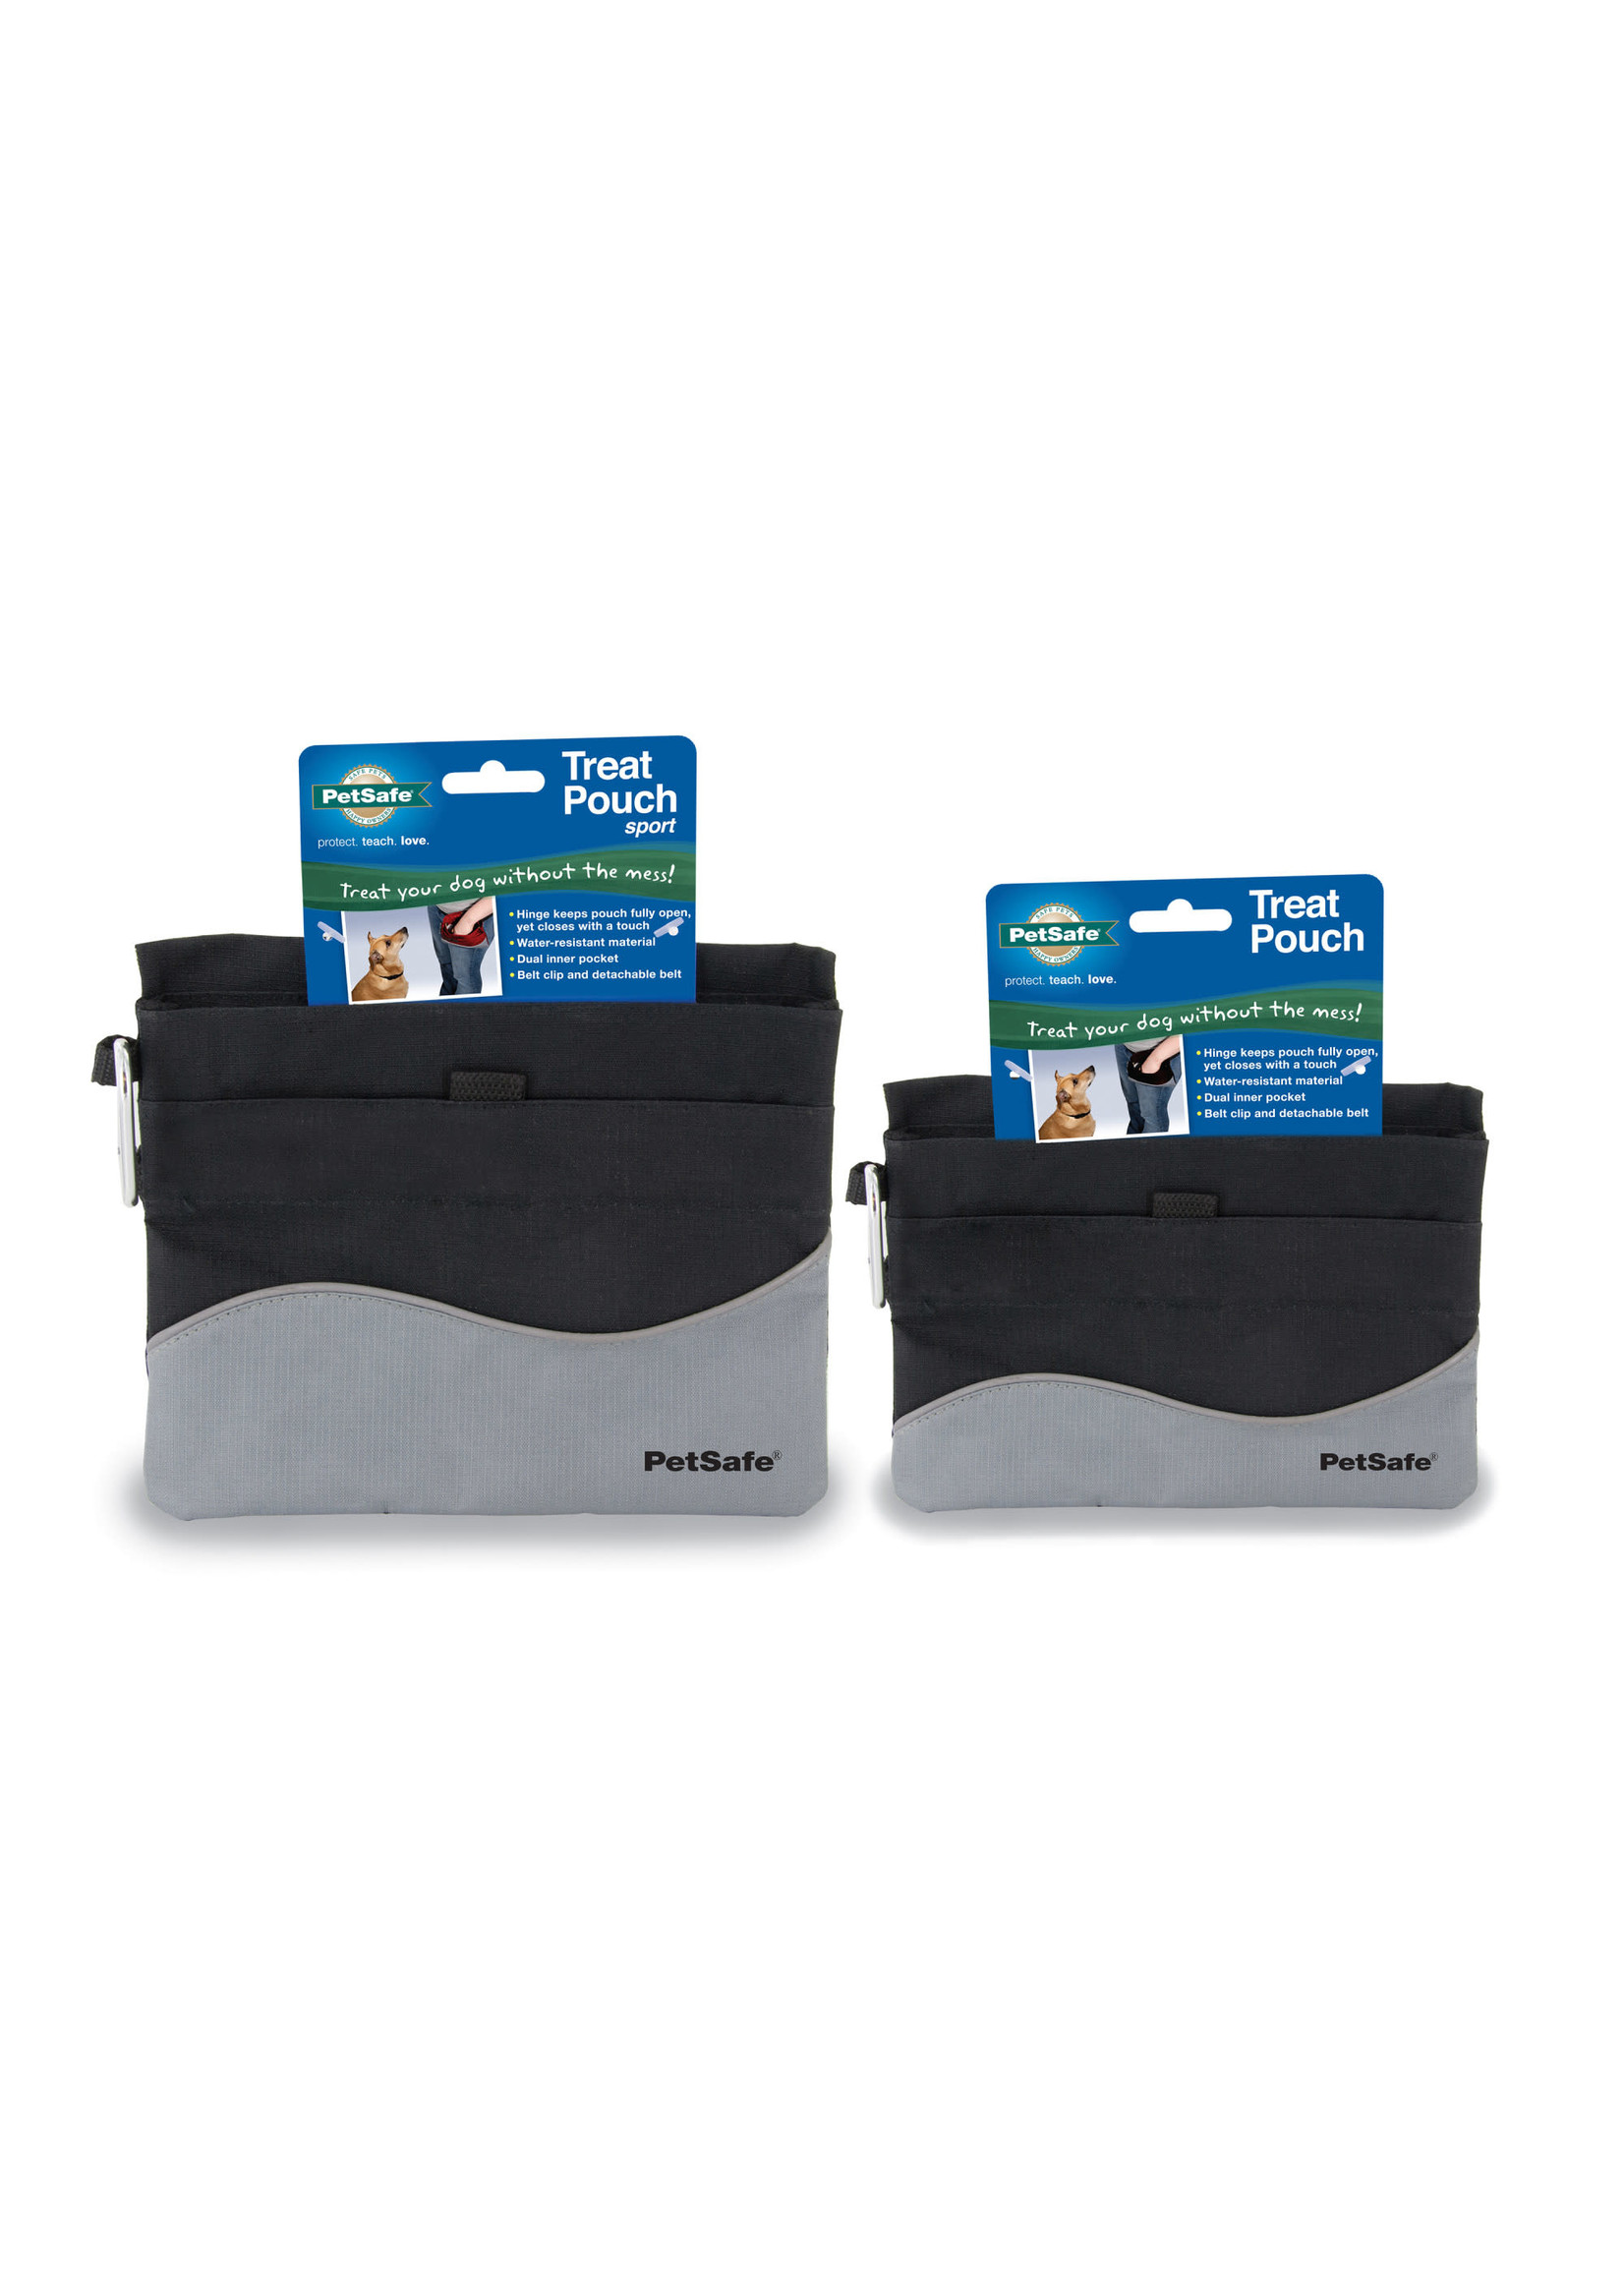 PetSafe PetSafe Treat Pouch Sport Black Mini